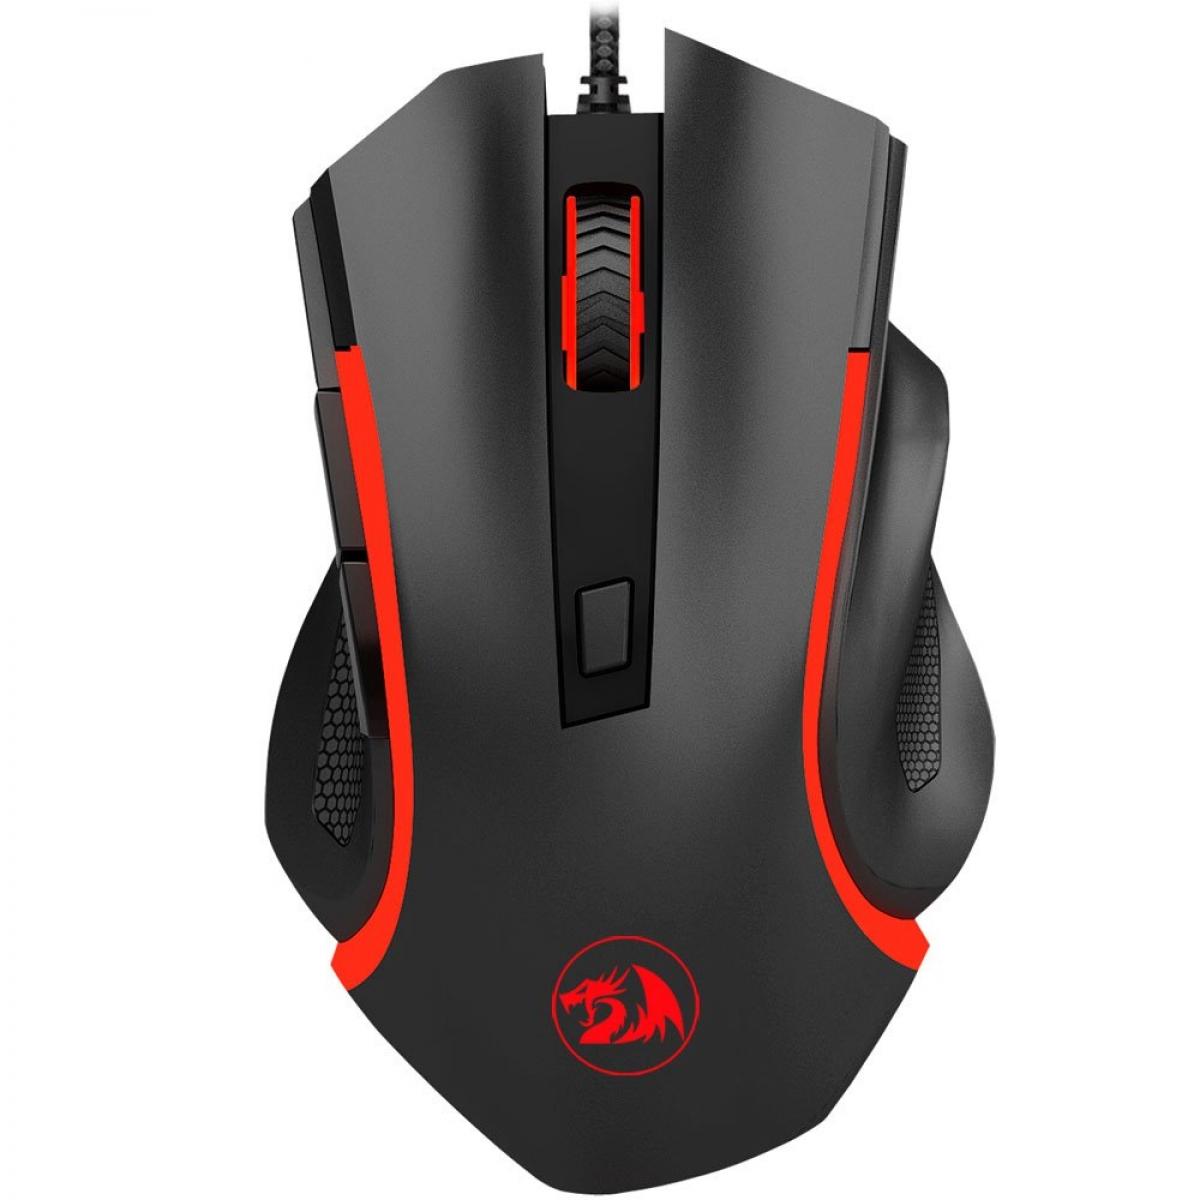 Mouse Gamer Redragon Nothosaur M606, 3200 DPI, 6 Botões Programáveis